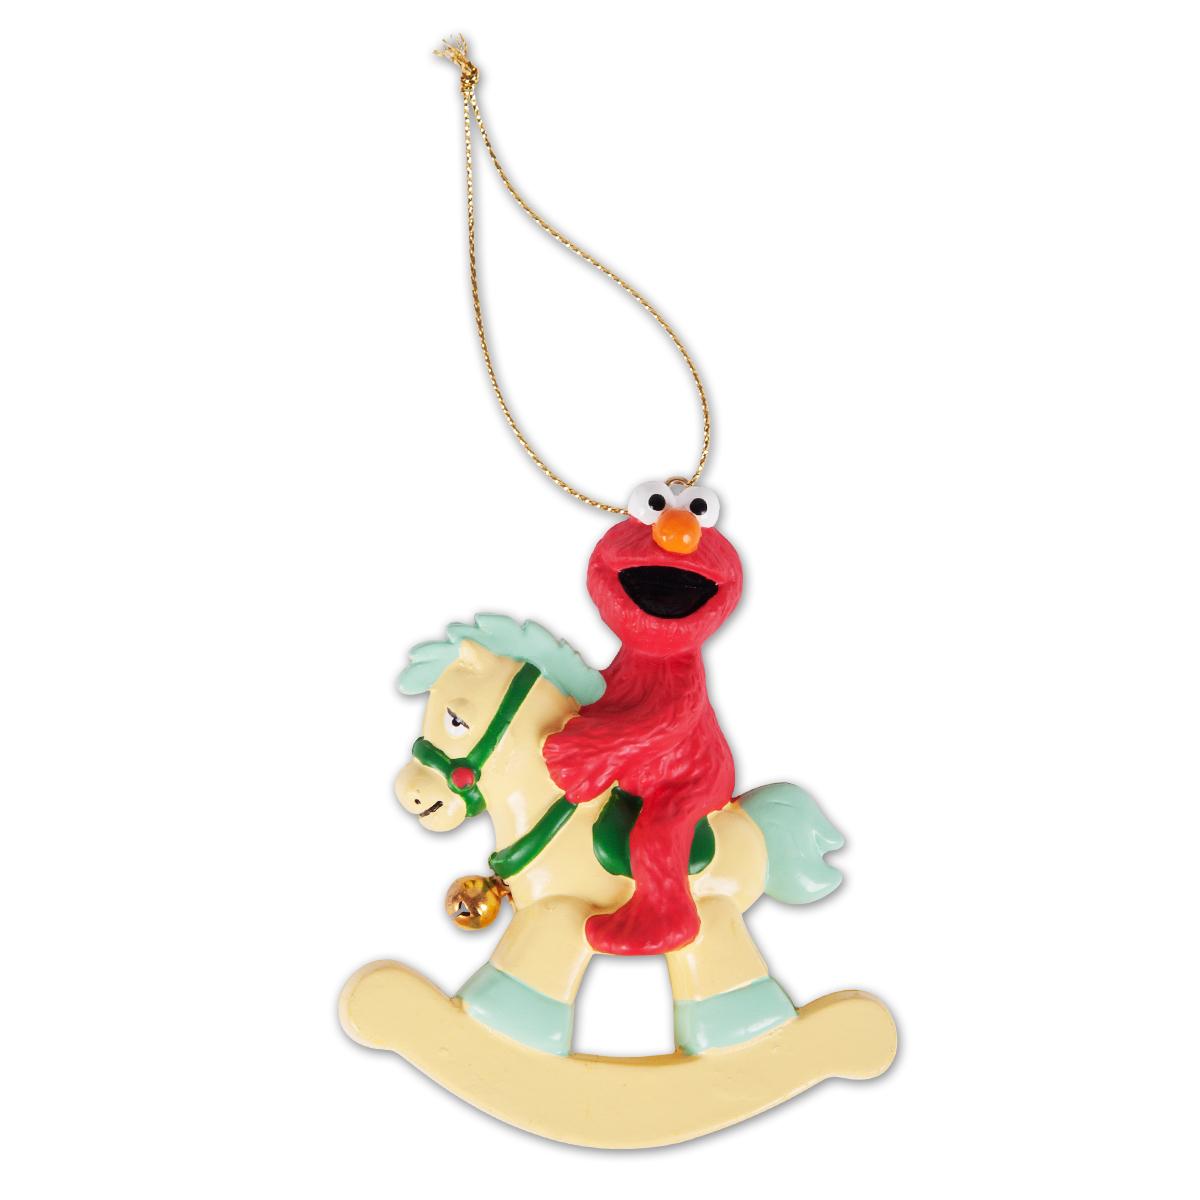 Elmo Rocking Horse Ornament